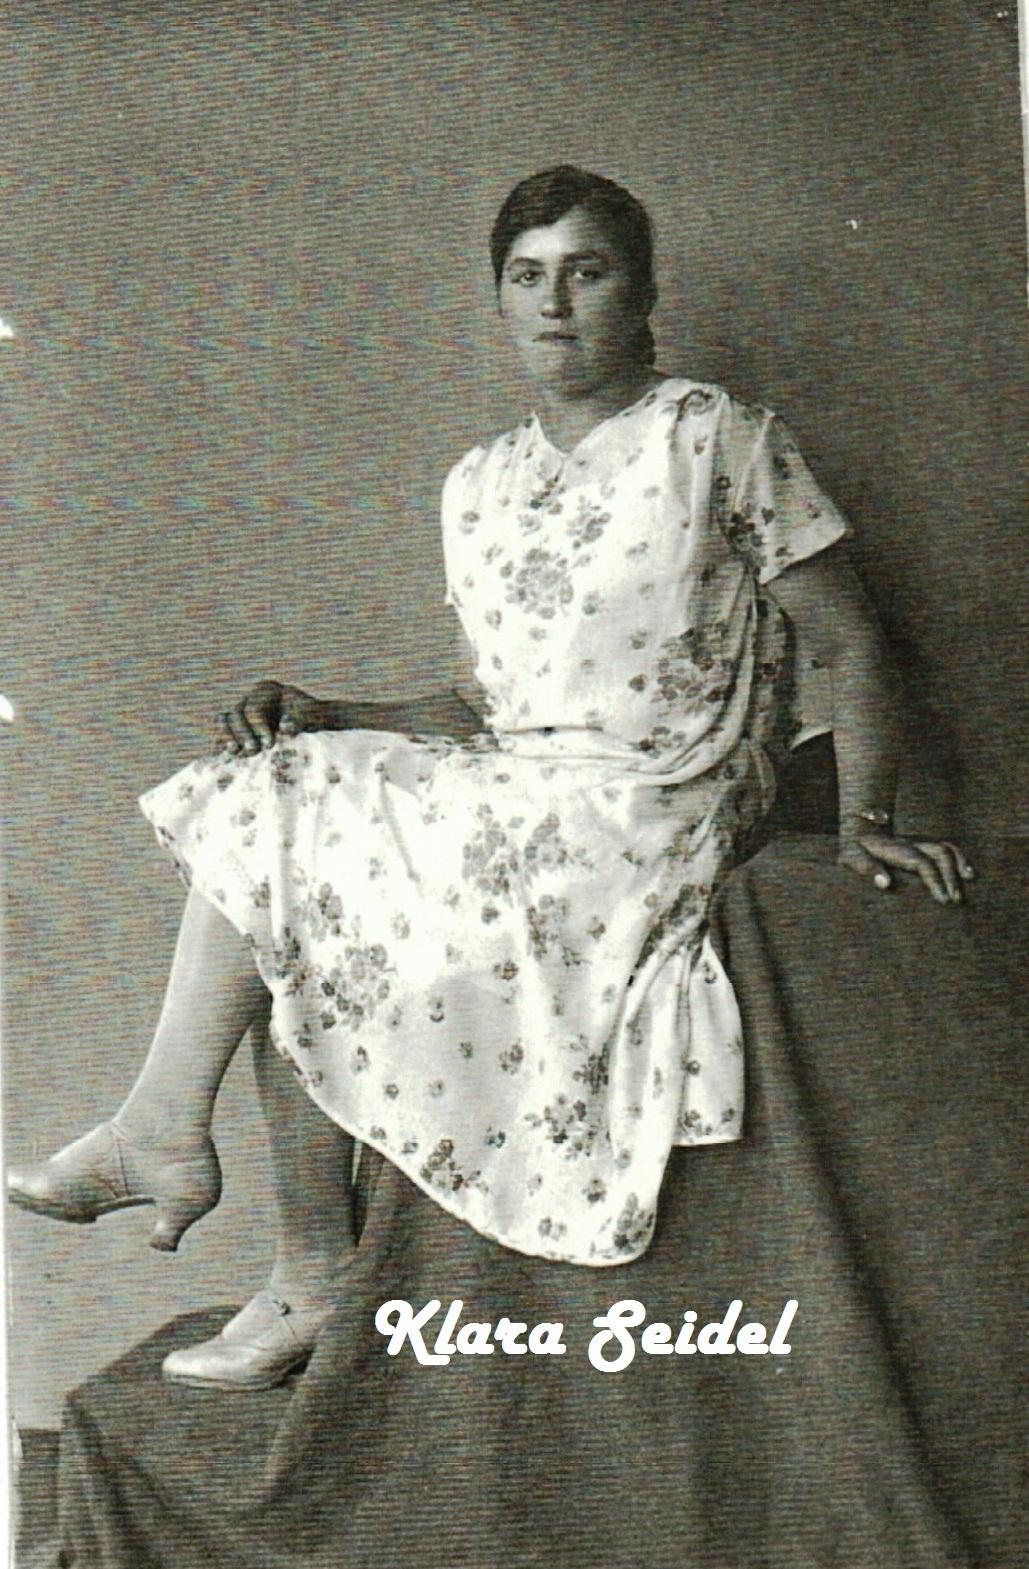 Klara Seidel